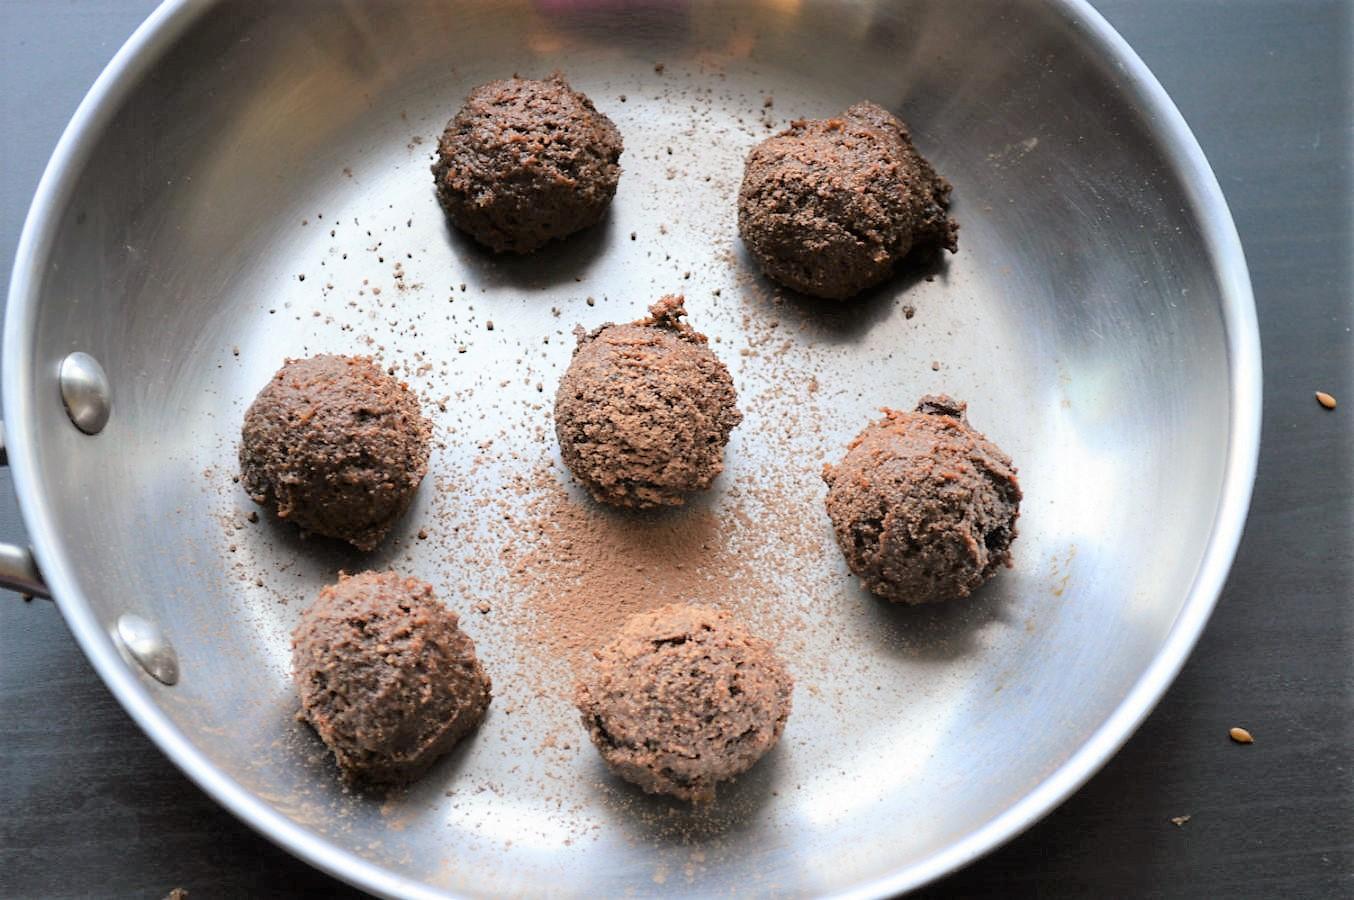 Vegan Flax Date Chocolate truffles